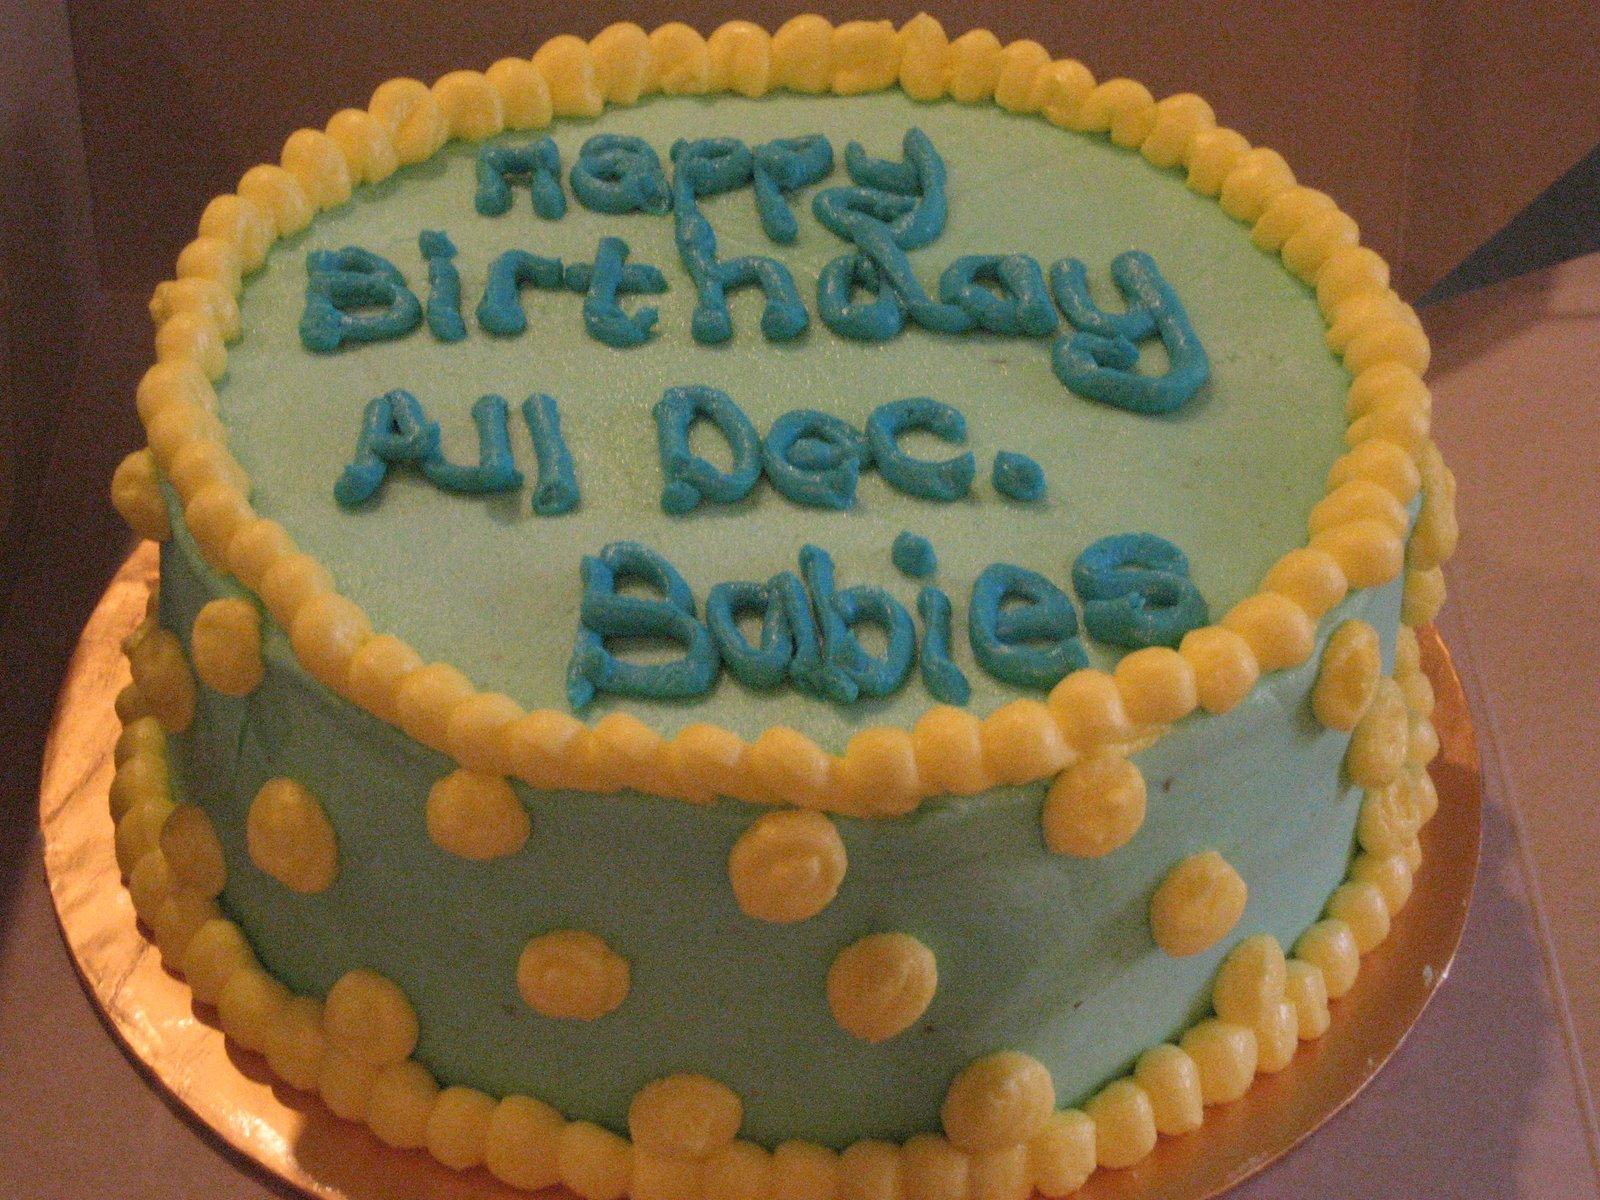 december birthday cakes - HD1600×1200